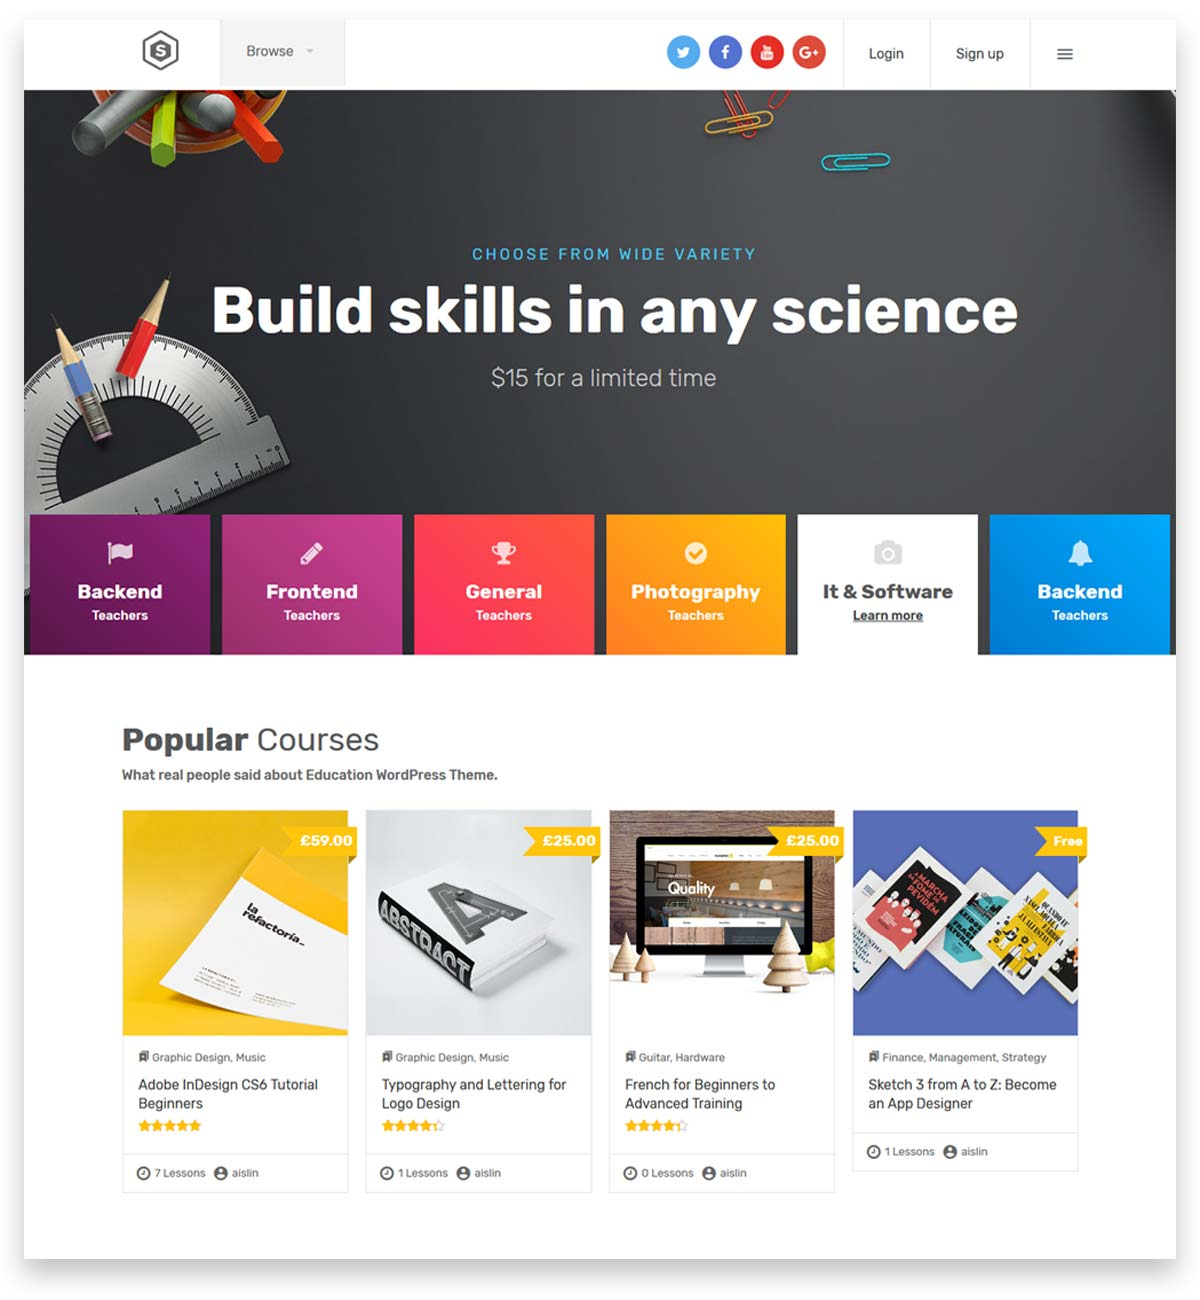 Skilled | School Education Courses WordPress Theme